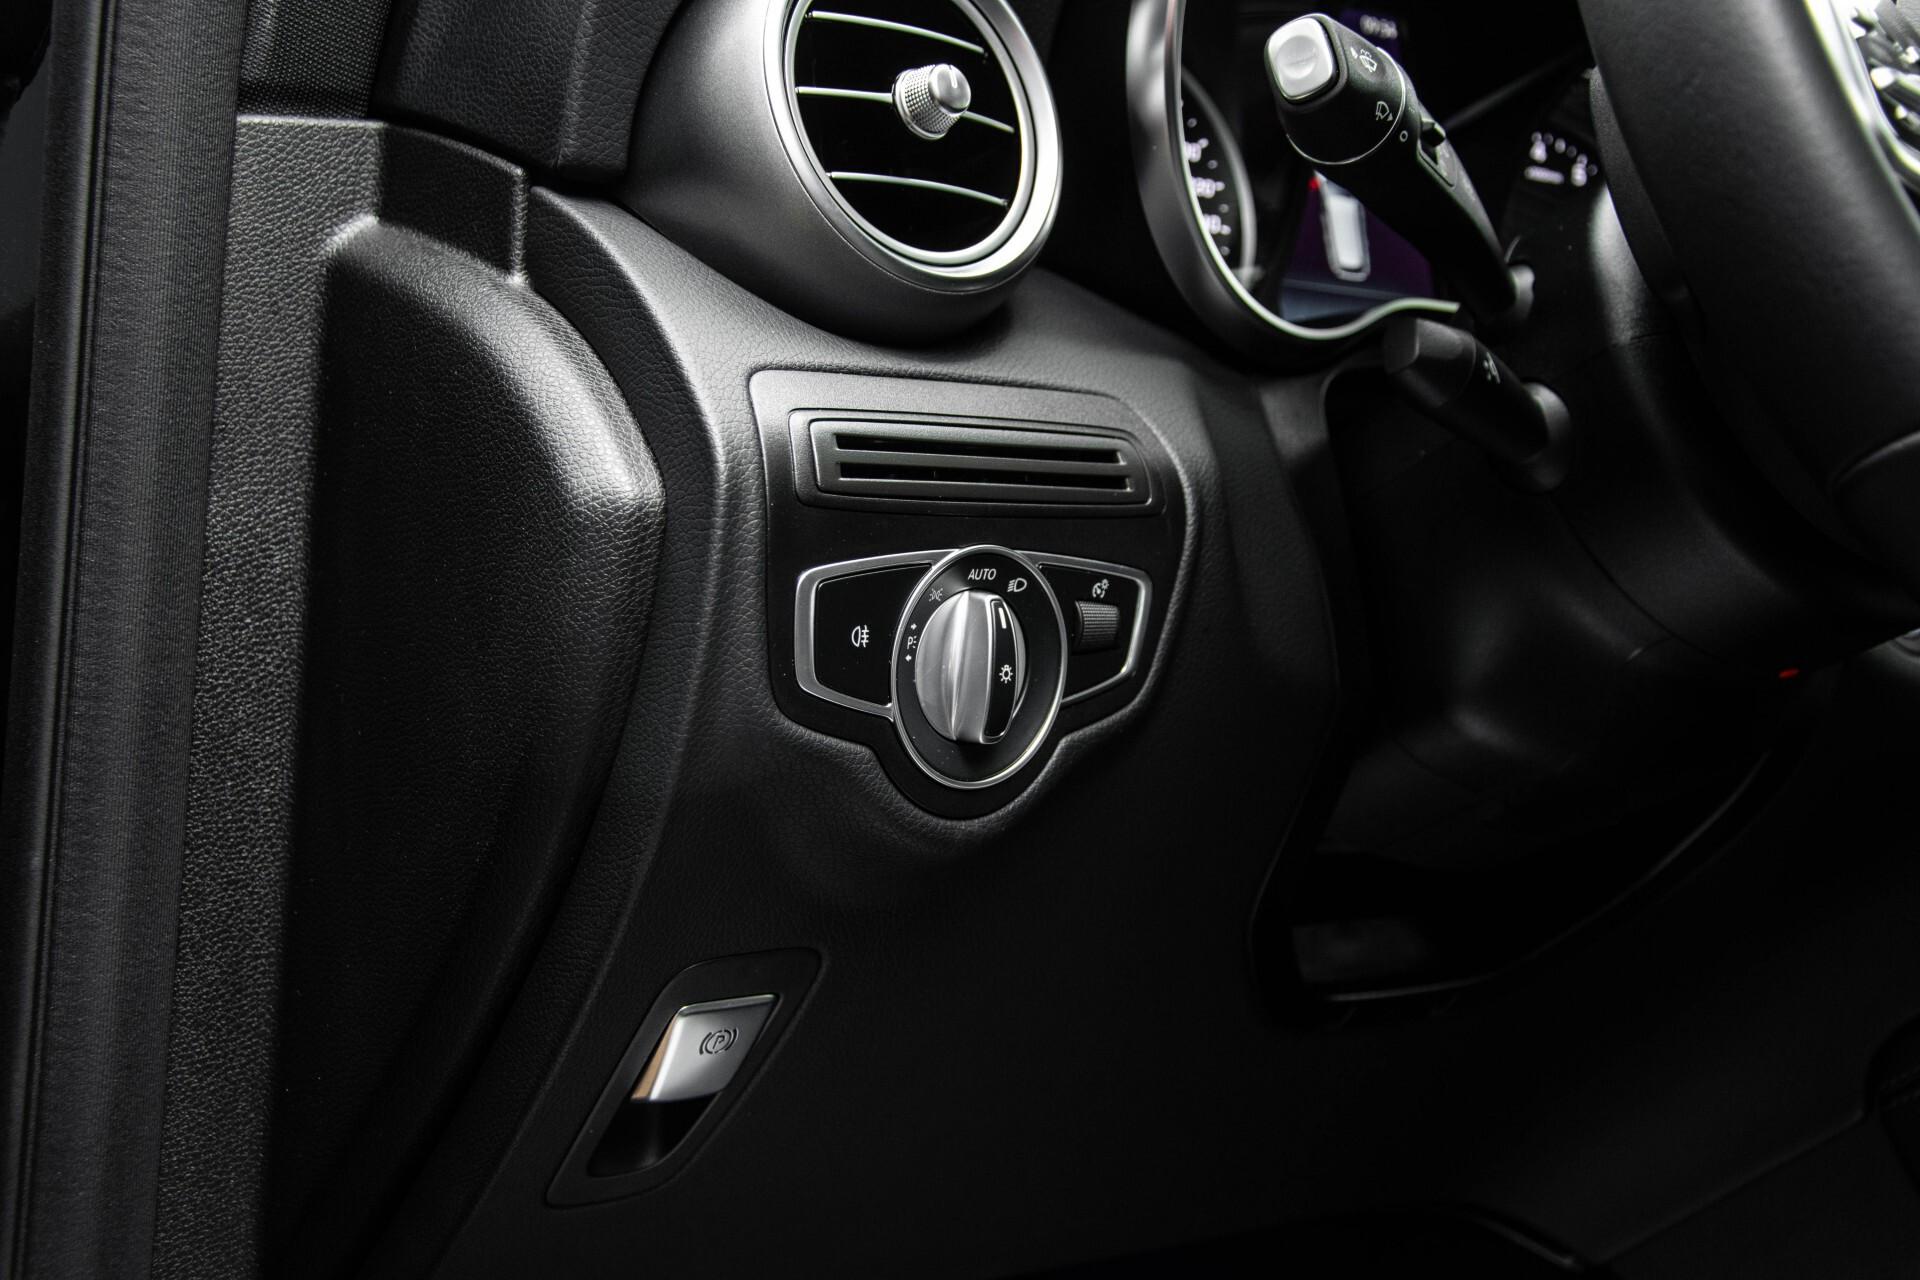 Mercedes-Benz GLC 200 4-M AMG Night/Panorama/Distronic Pro/Burmester/360camera/Exclusive Aut9 Foto 40